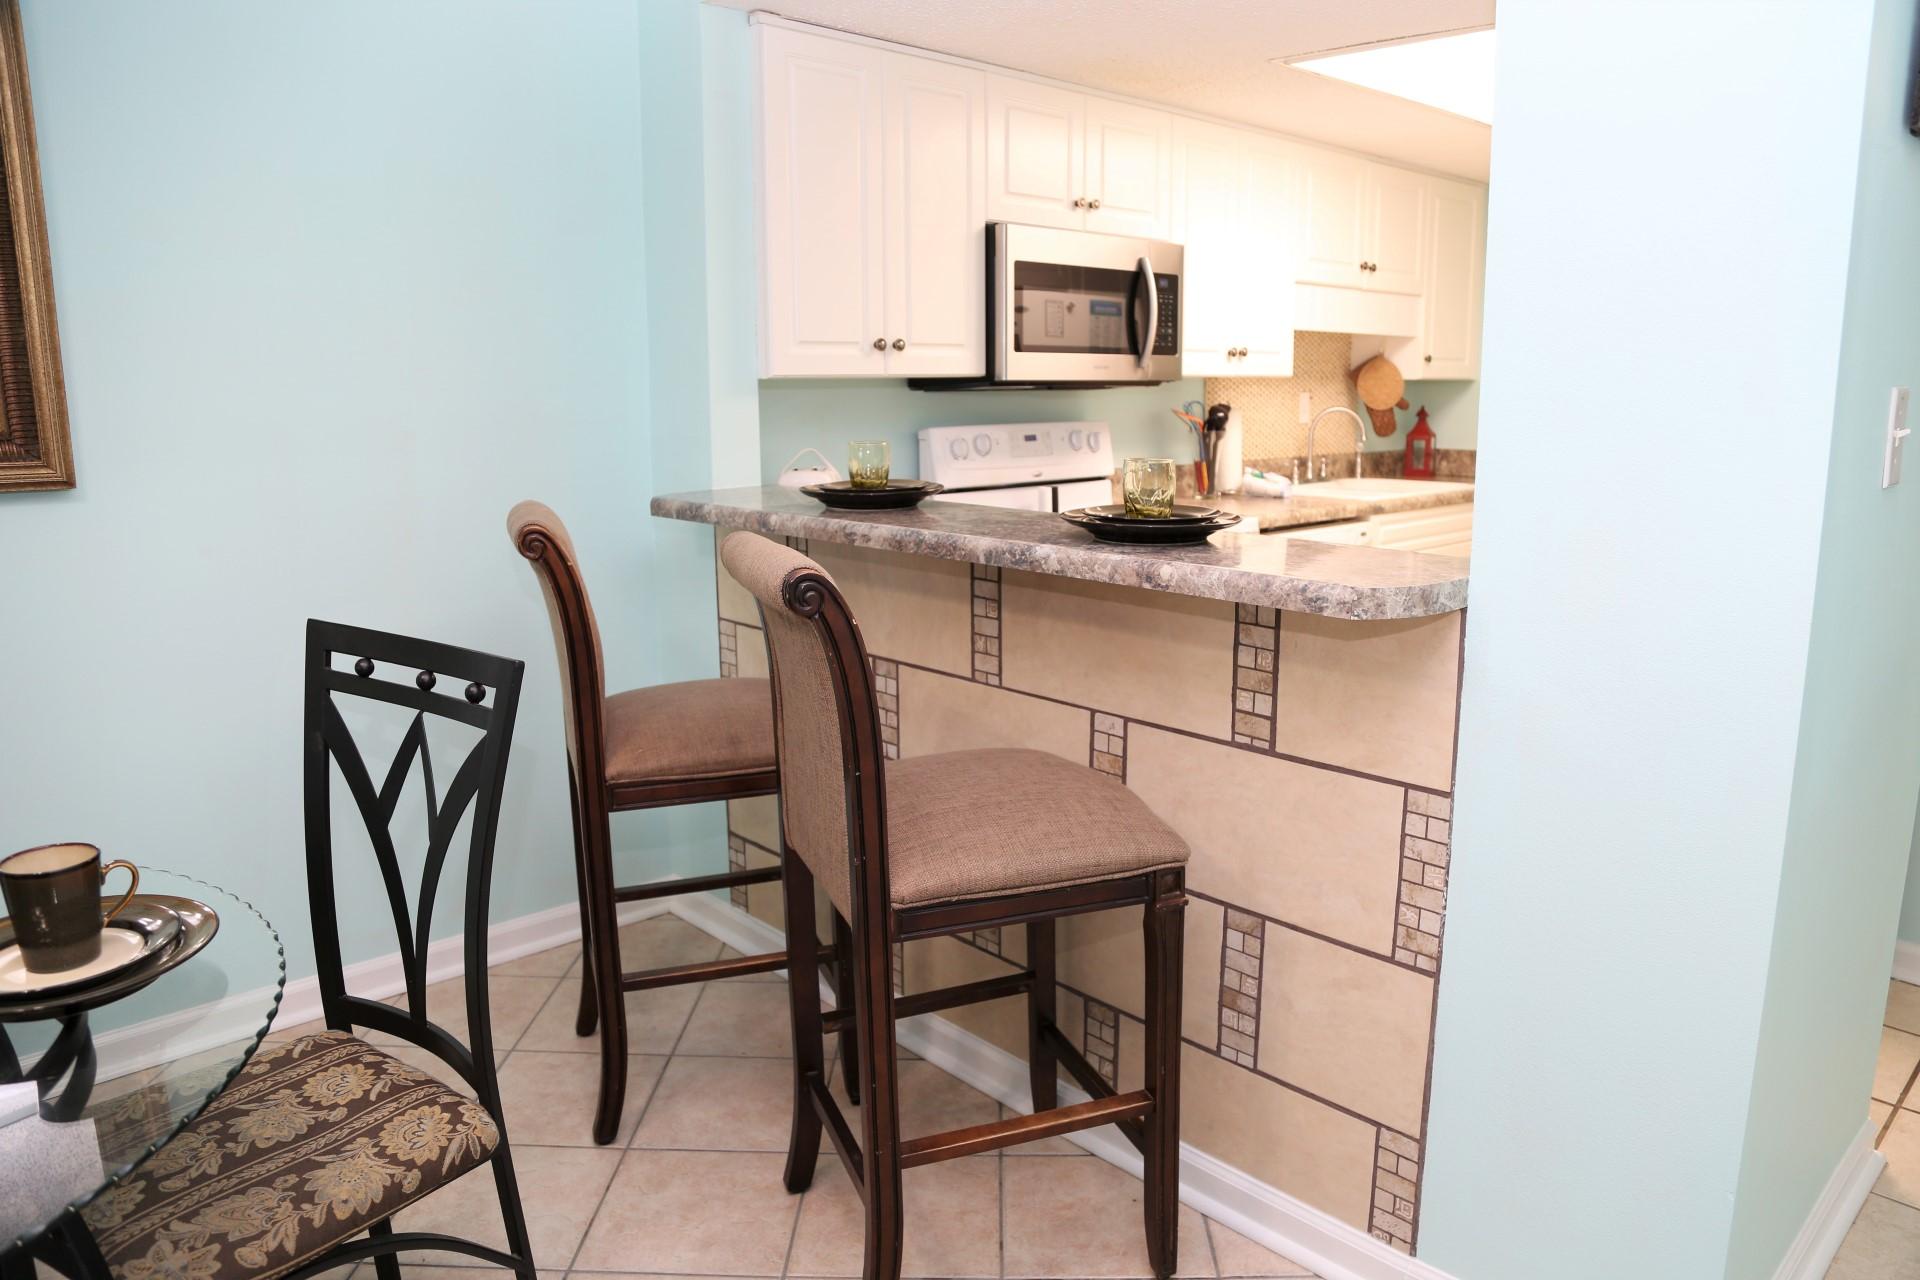 Castaways 1B - Kitchen and bar stools